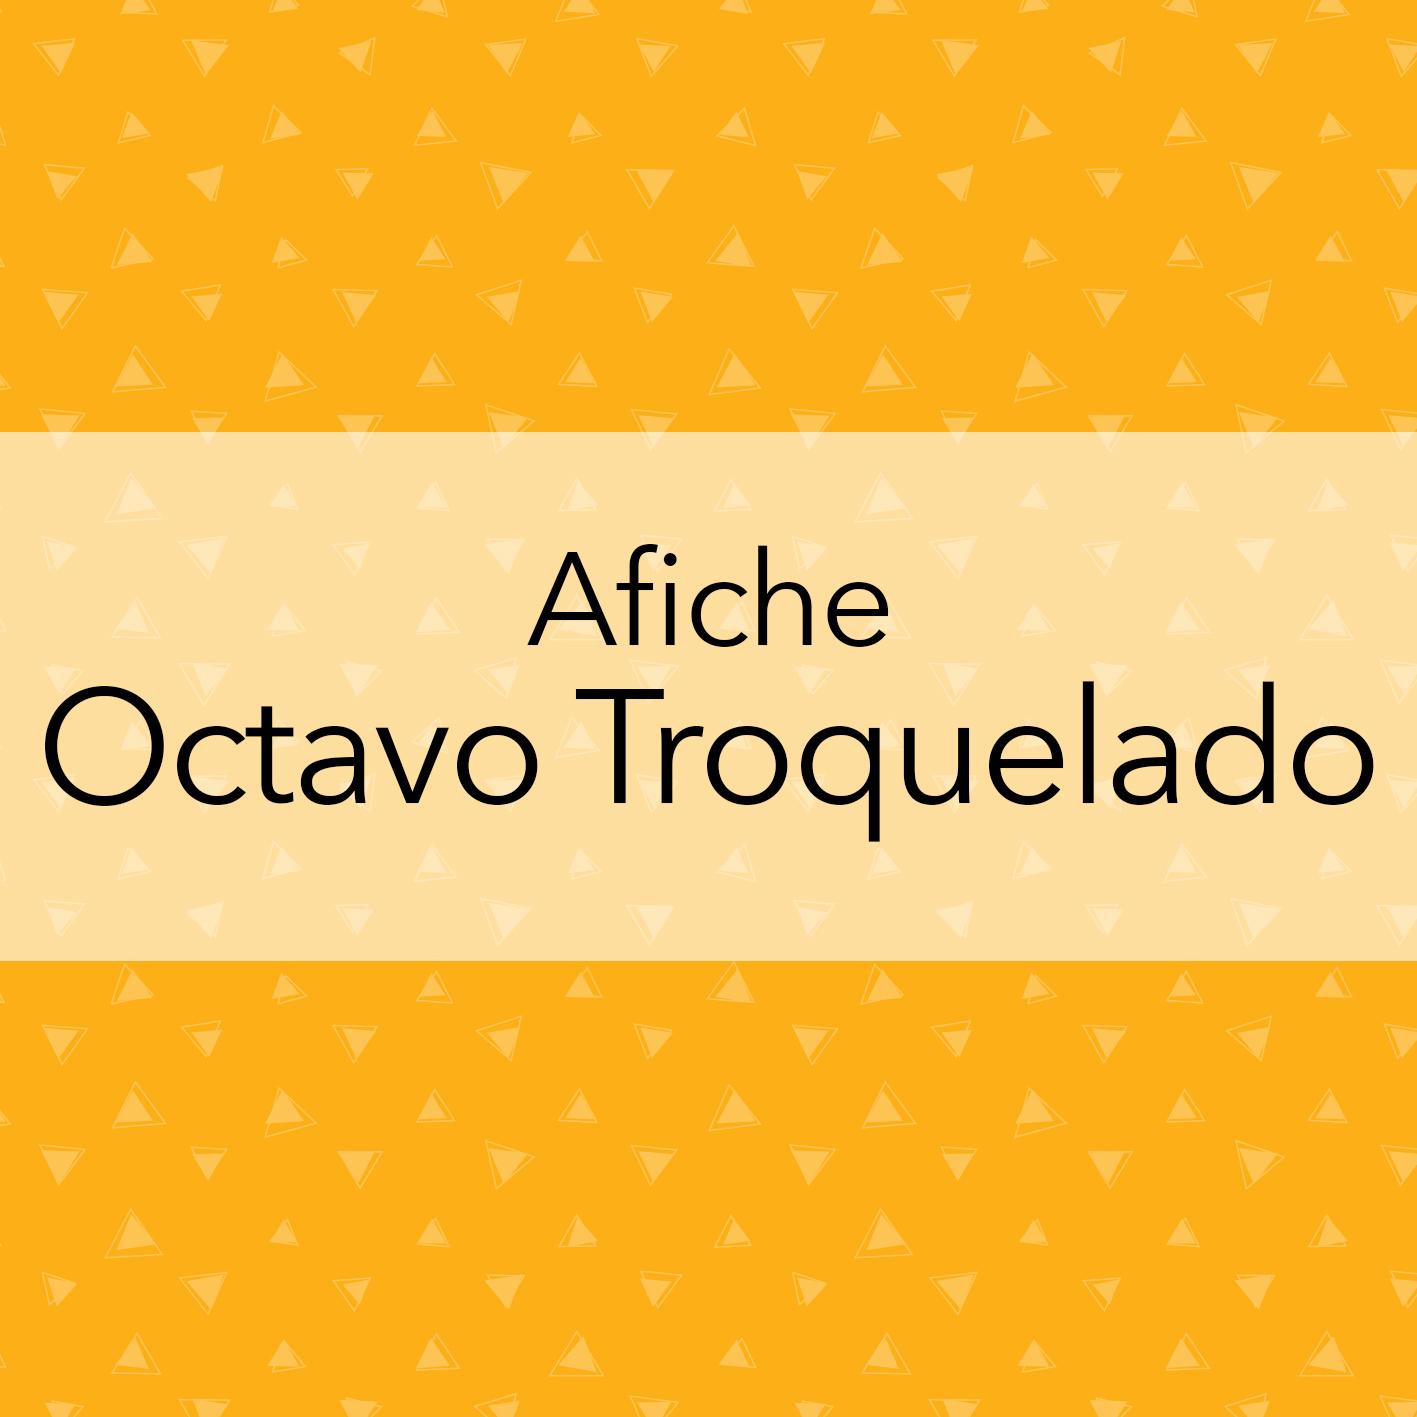 AFICHE OCTAVO TROQUELADO